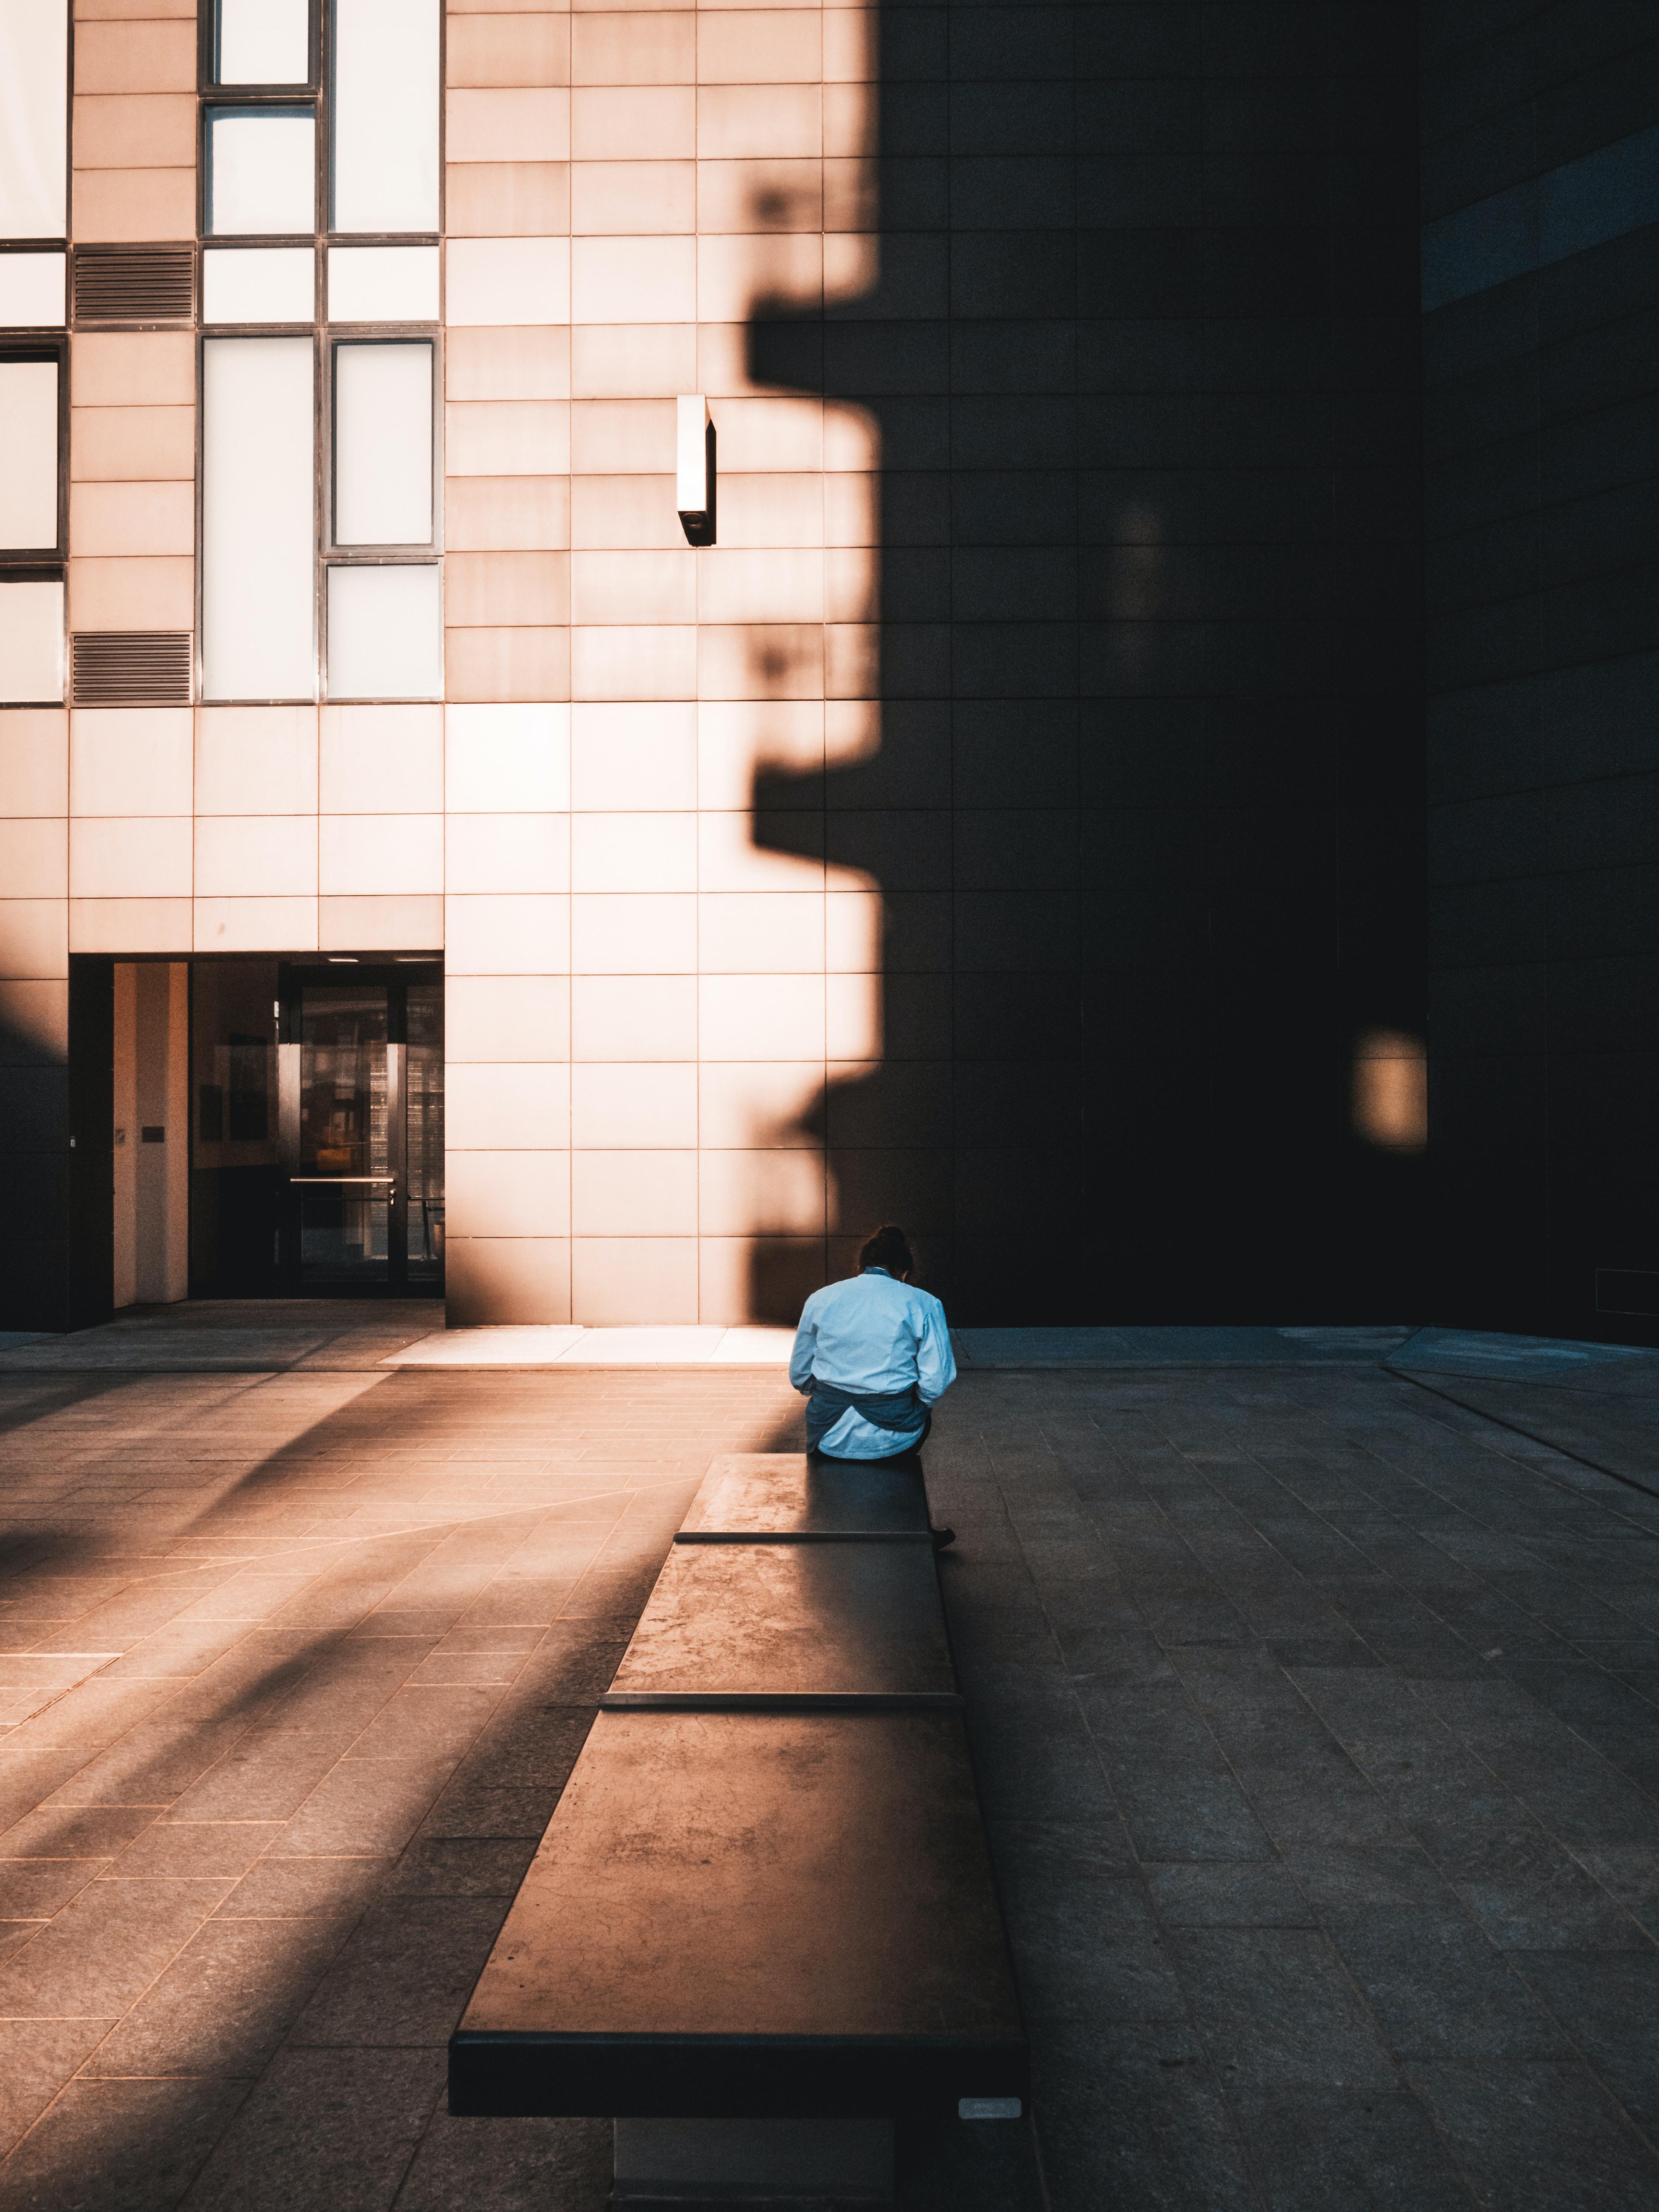 Lear Photography - https://mikitayo.com/blog